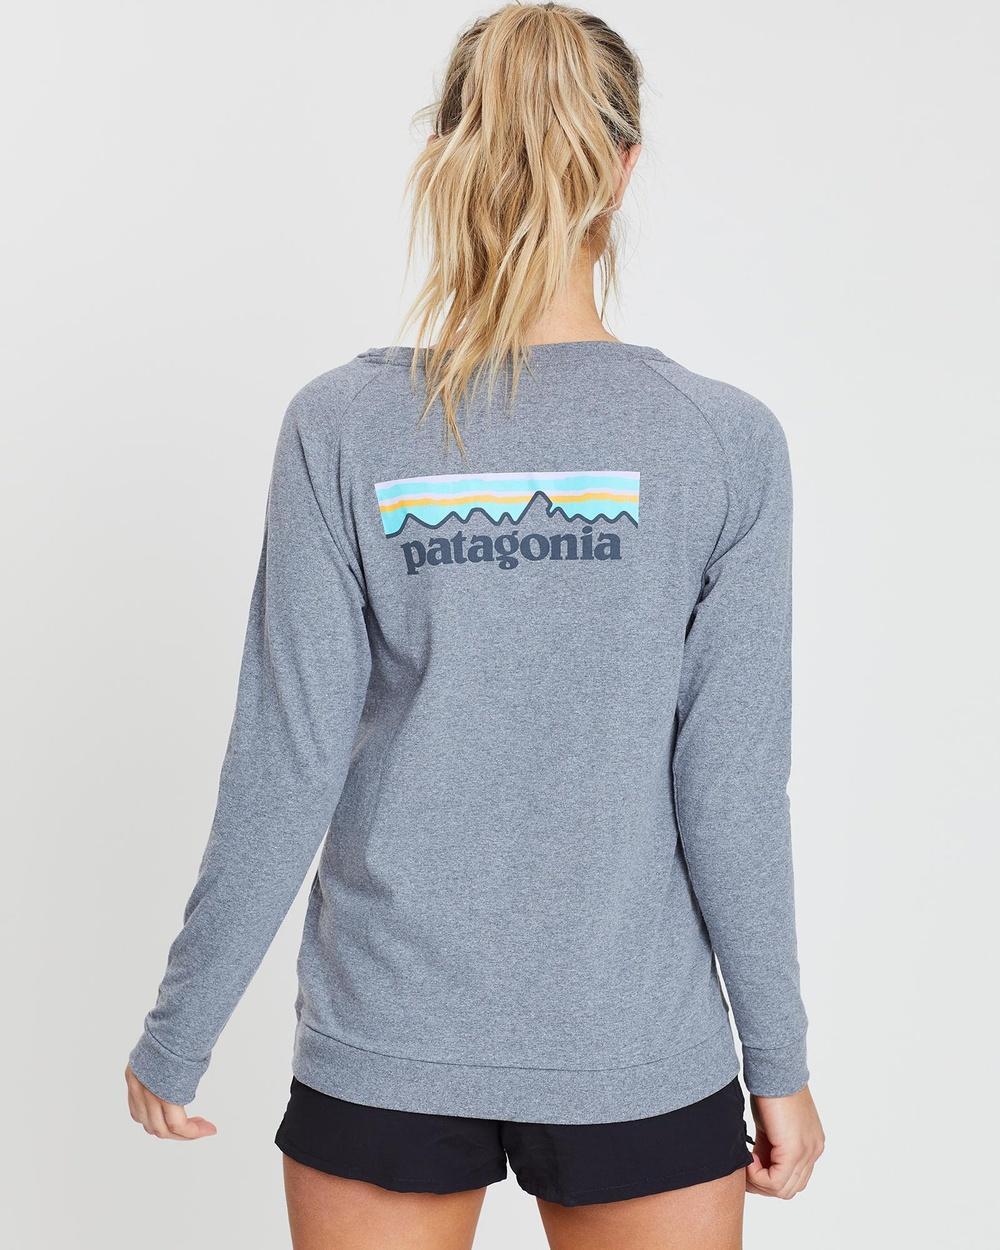 Patagonia - Women's Long Sleeve Pastel P 6 Logo Responsibili Tee - Long Sleeve T-Shirts (Gravel Heather) Women's Long Sleeve Pastel P-6 Logo Responsibili-Tee